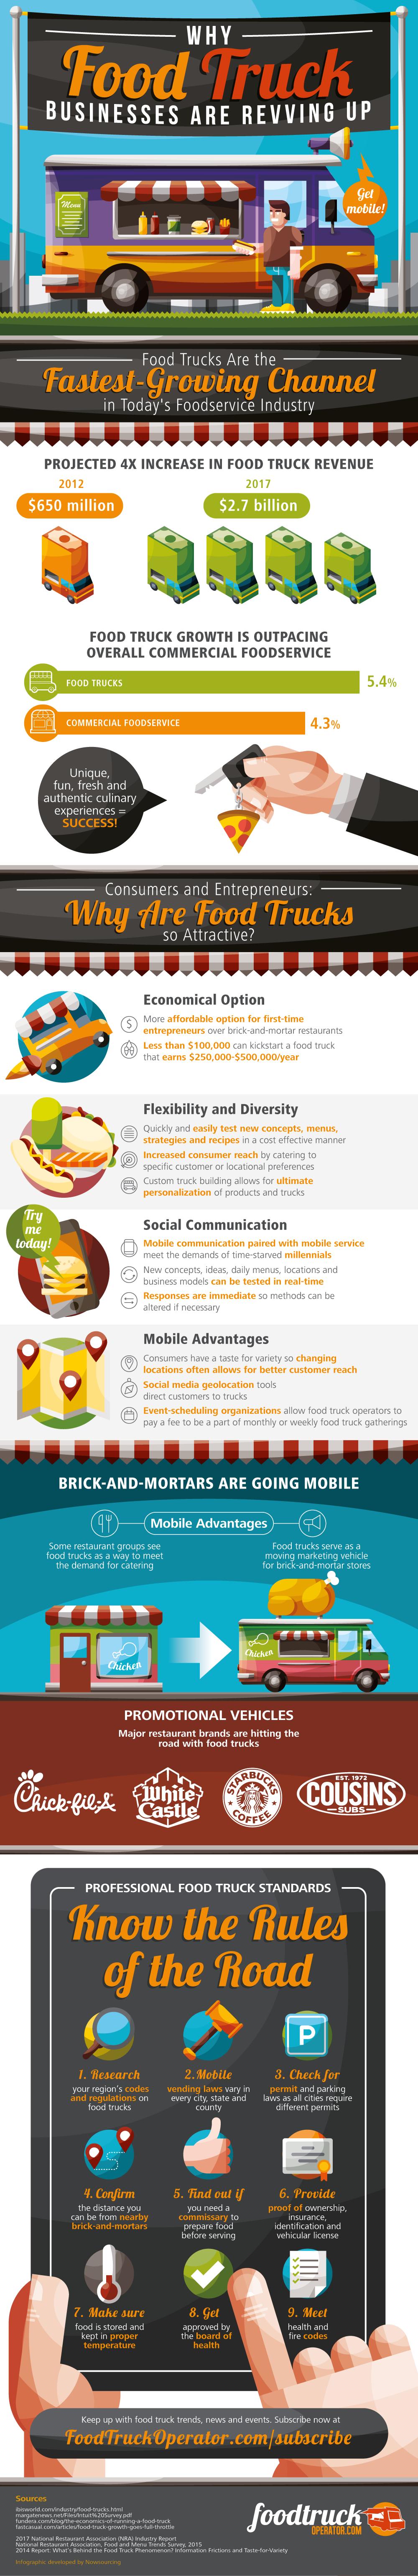 https://assets.entrepreneur.com/images/misc/1493994510_food-truck_infographic.png